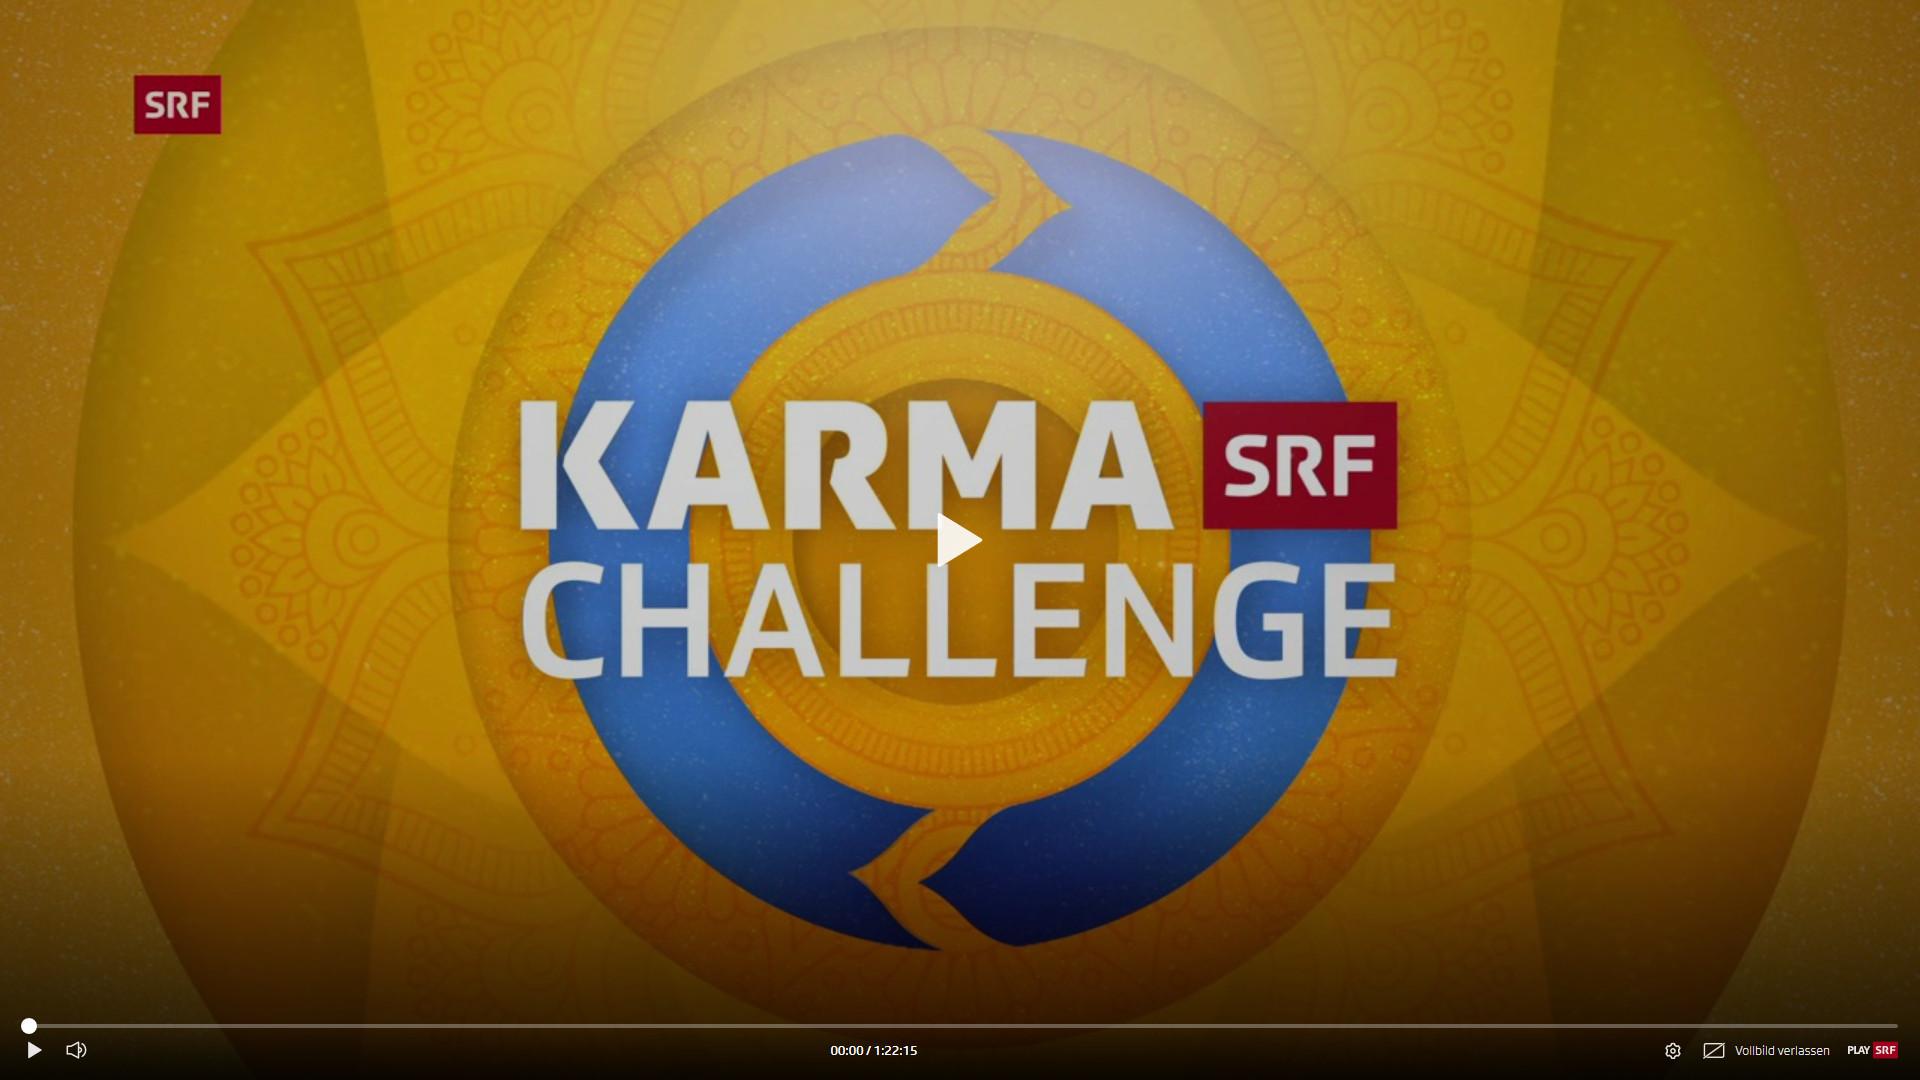 SRF Karma Challenge